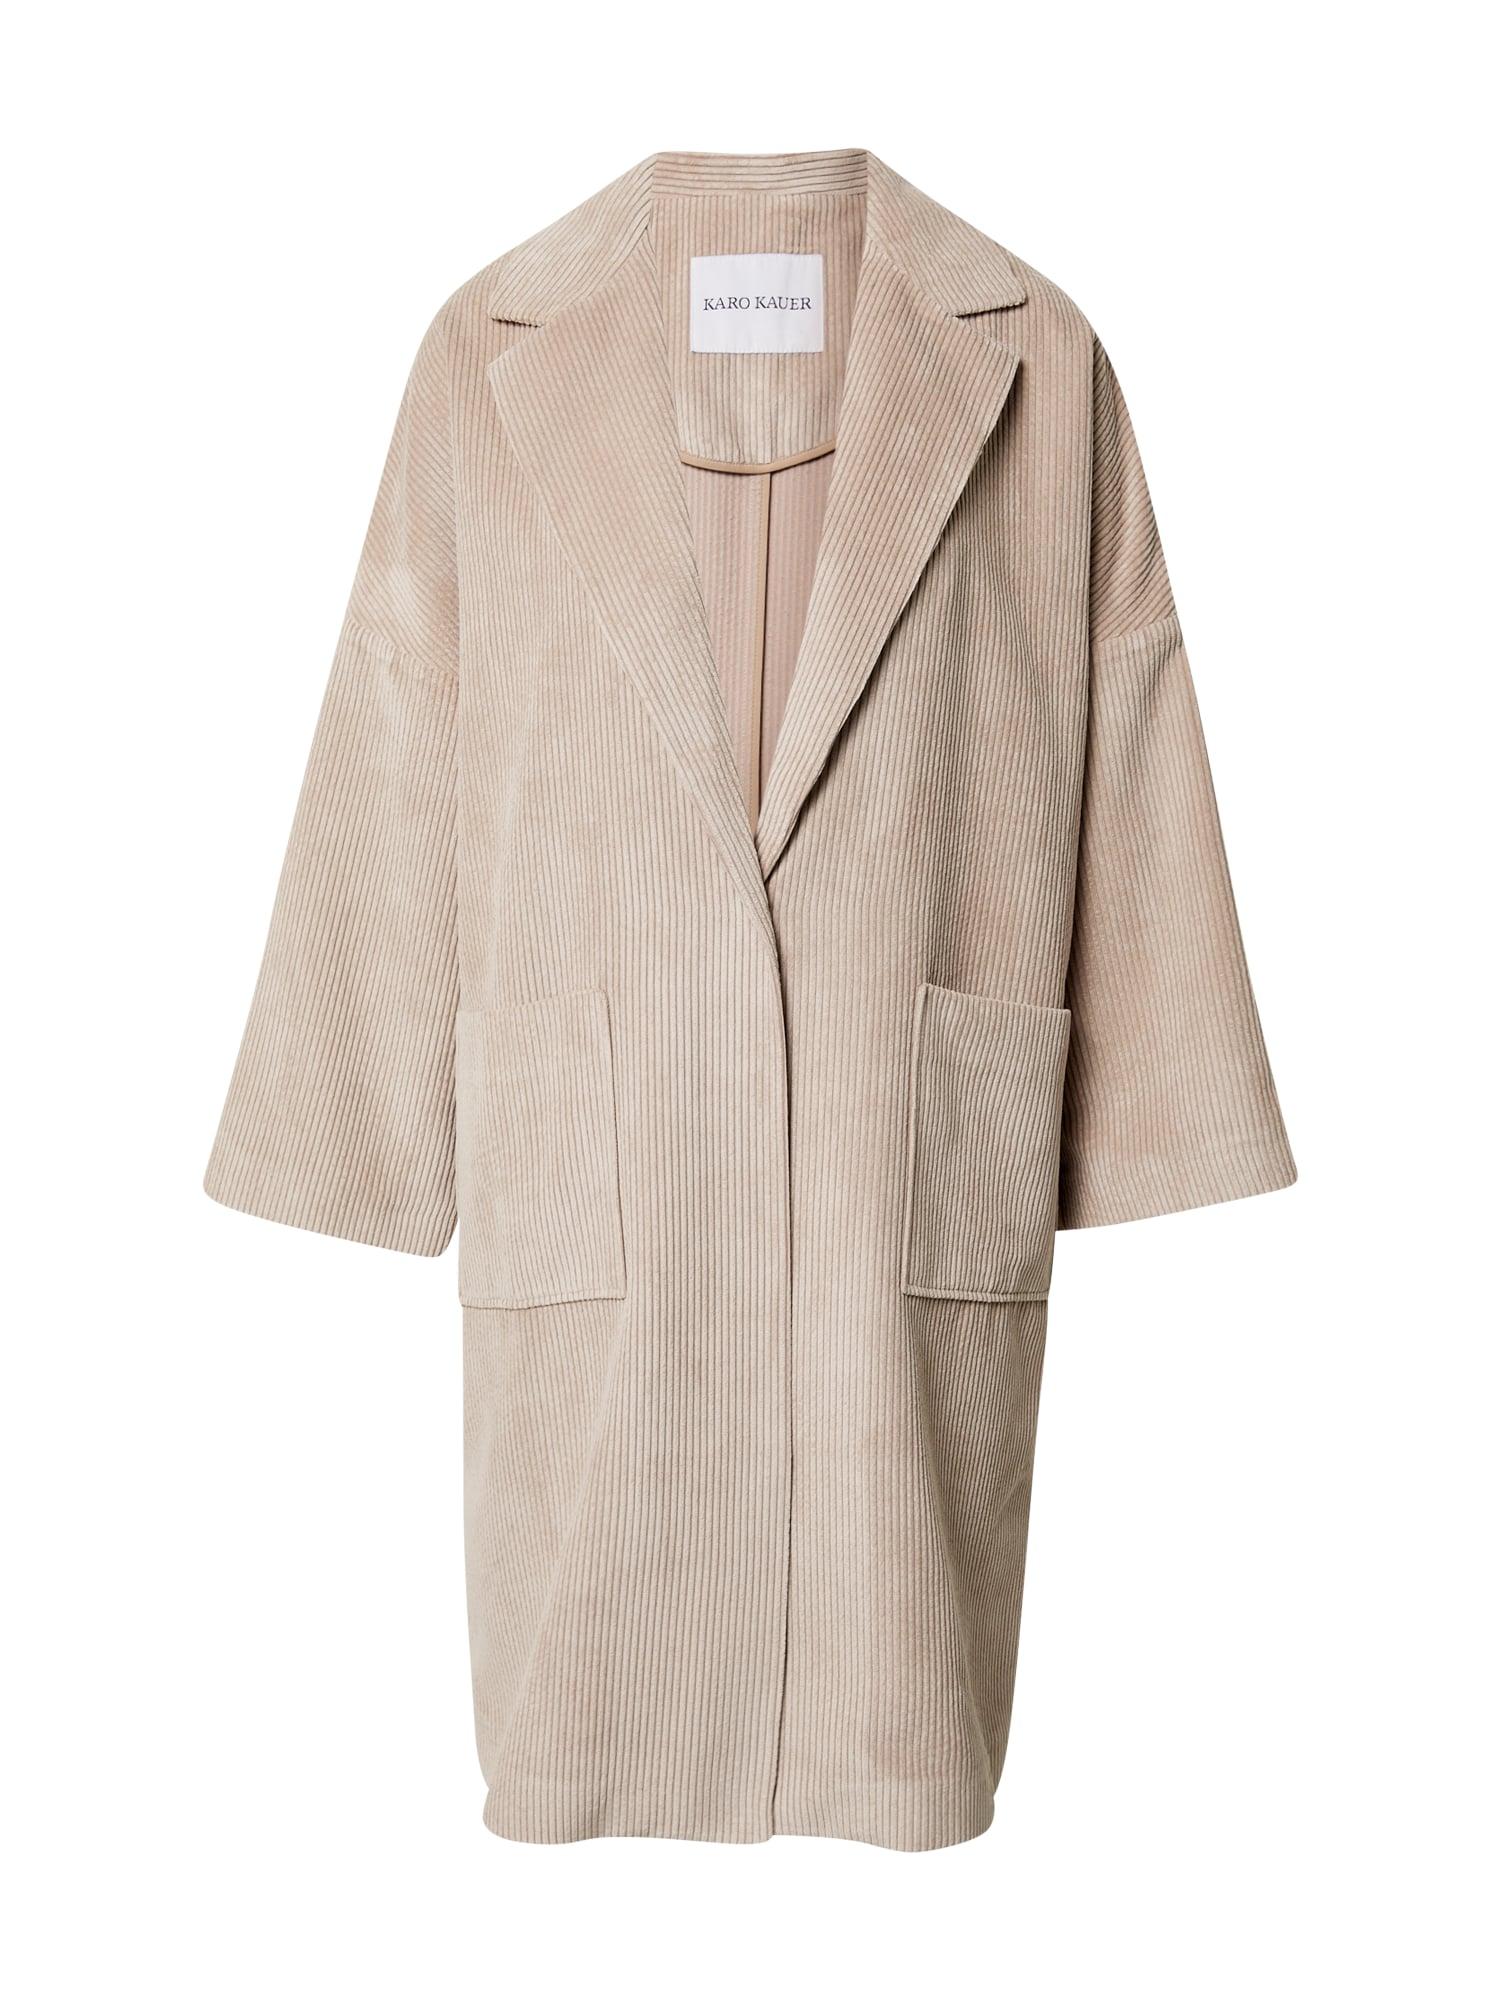 Karo Kauer Demisezoninis paltas